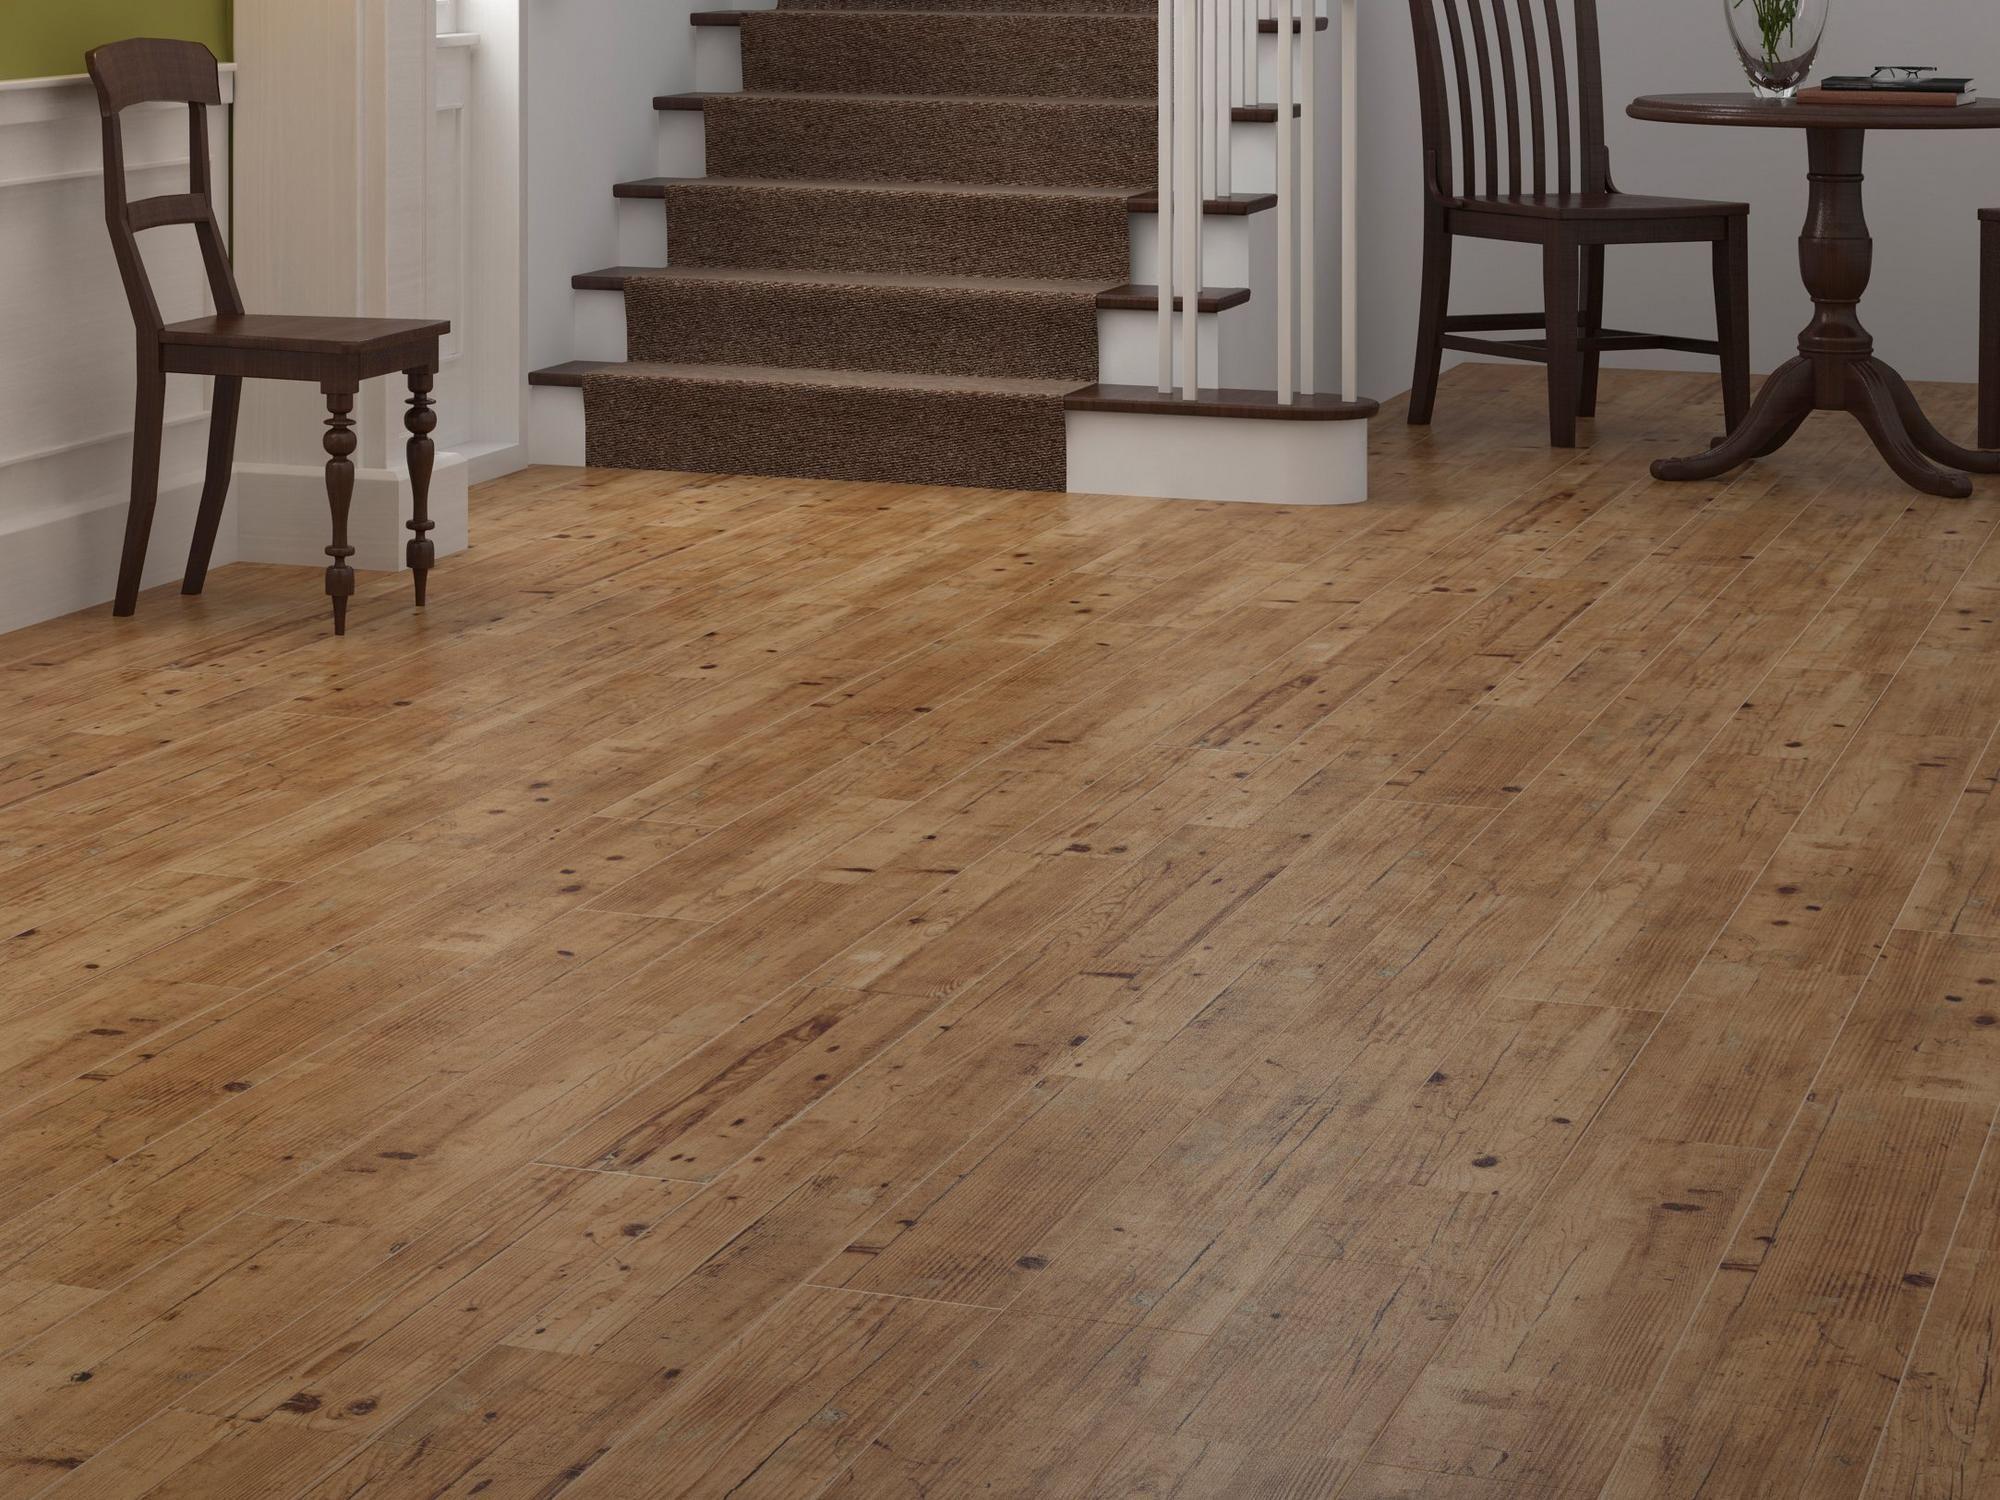 Brunswick Oak Wood Plank Ceramic Tile Floor Decor In 2020 Wood Planks Ceramic Floor Tiles Wood Look Tile